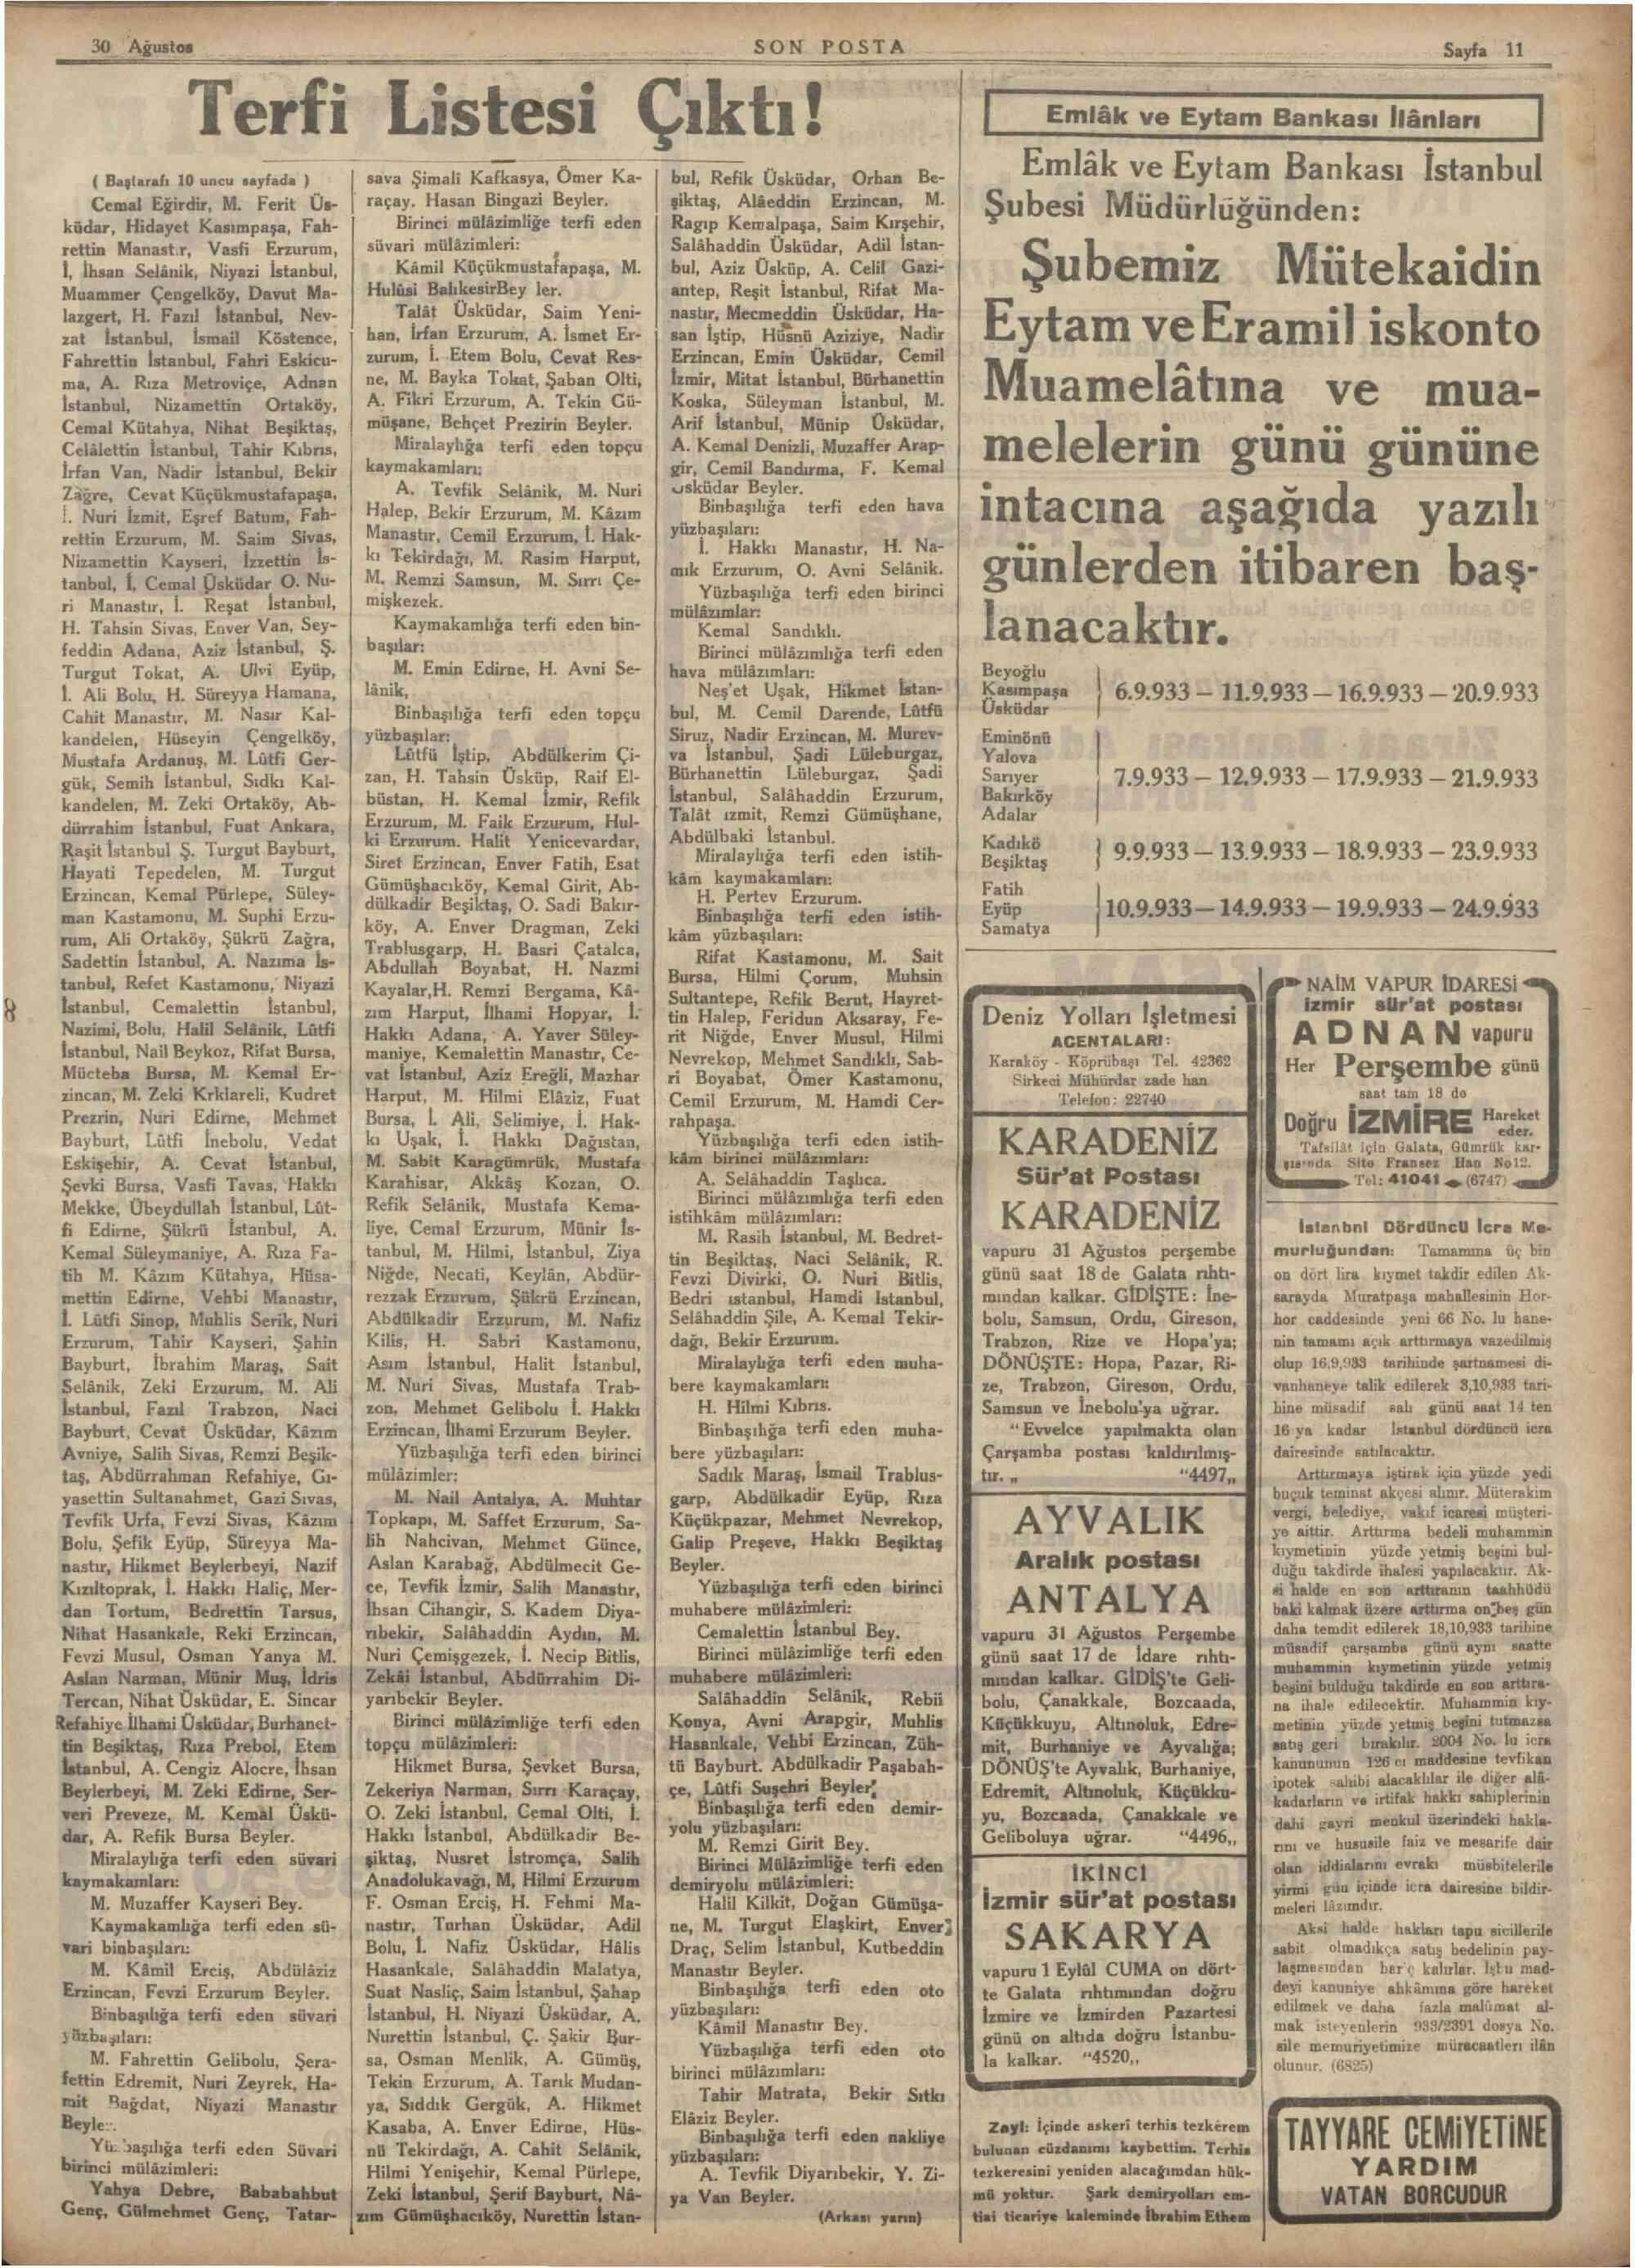 30 Ağustos 1933 Tarihli Son Posta Gazetesi Sayfa 11